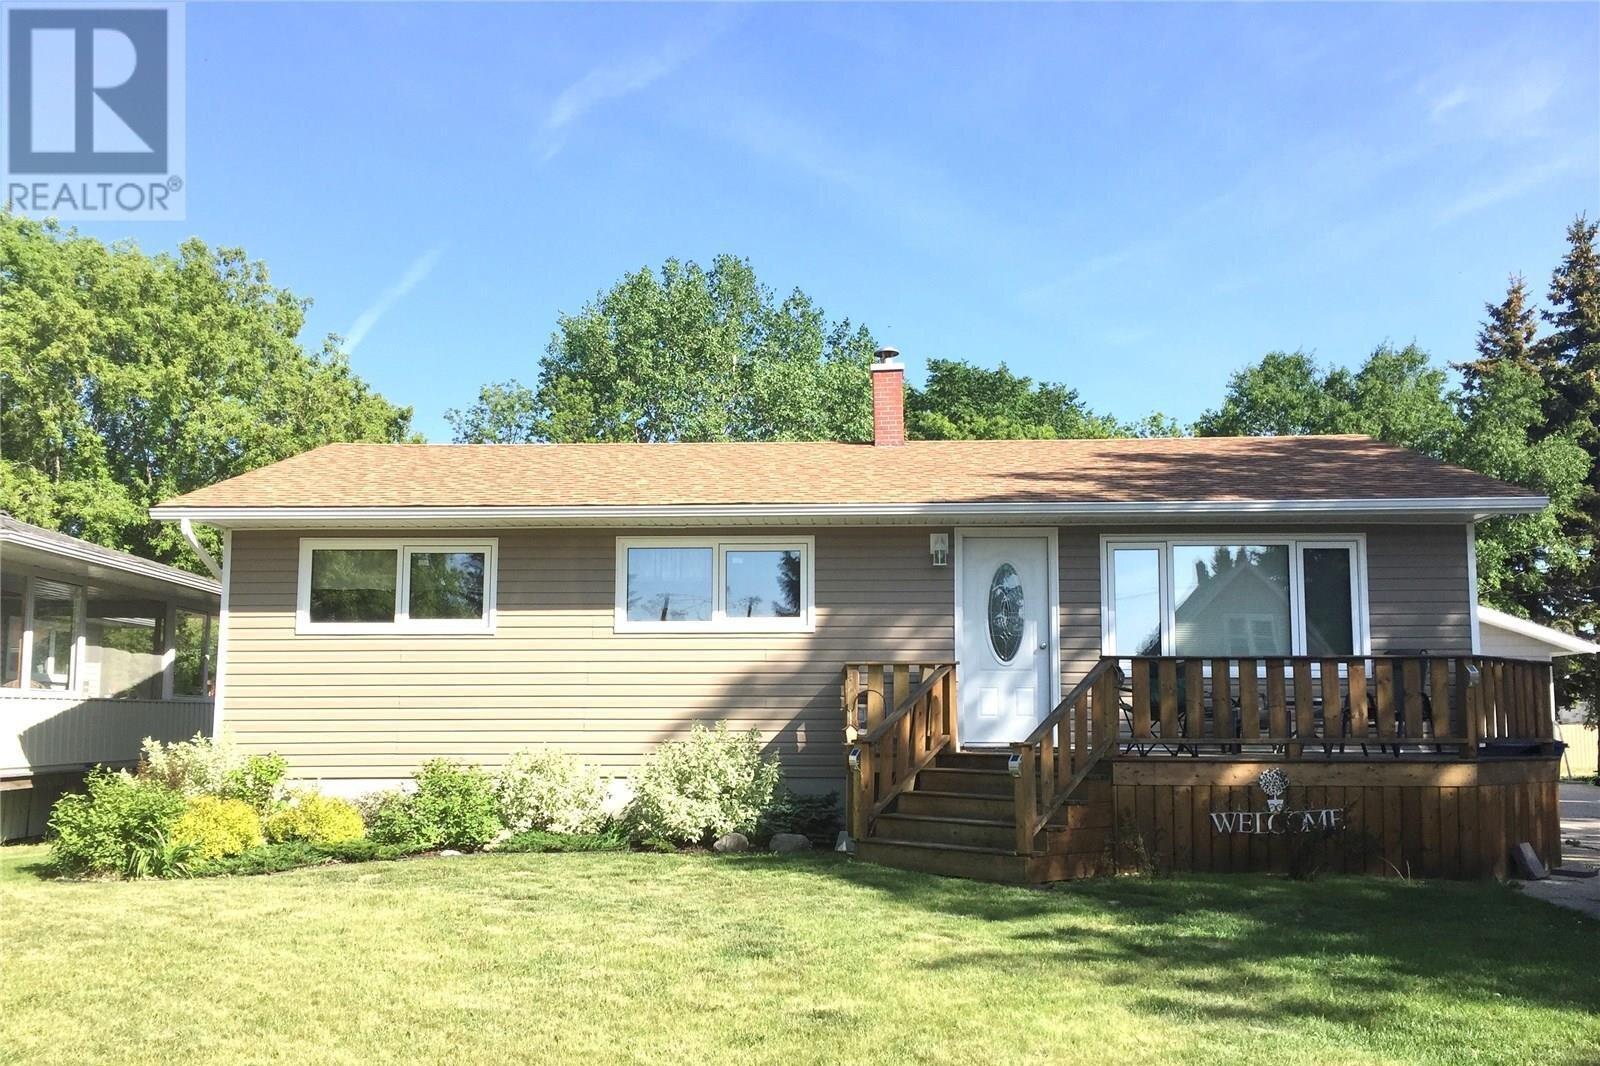 House for sale at 809 Mcnaughton St Moosomin Saskatchewan - MLS: SK827696